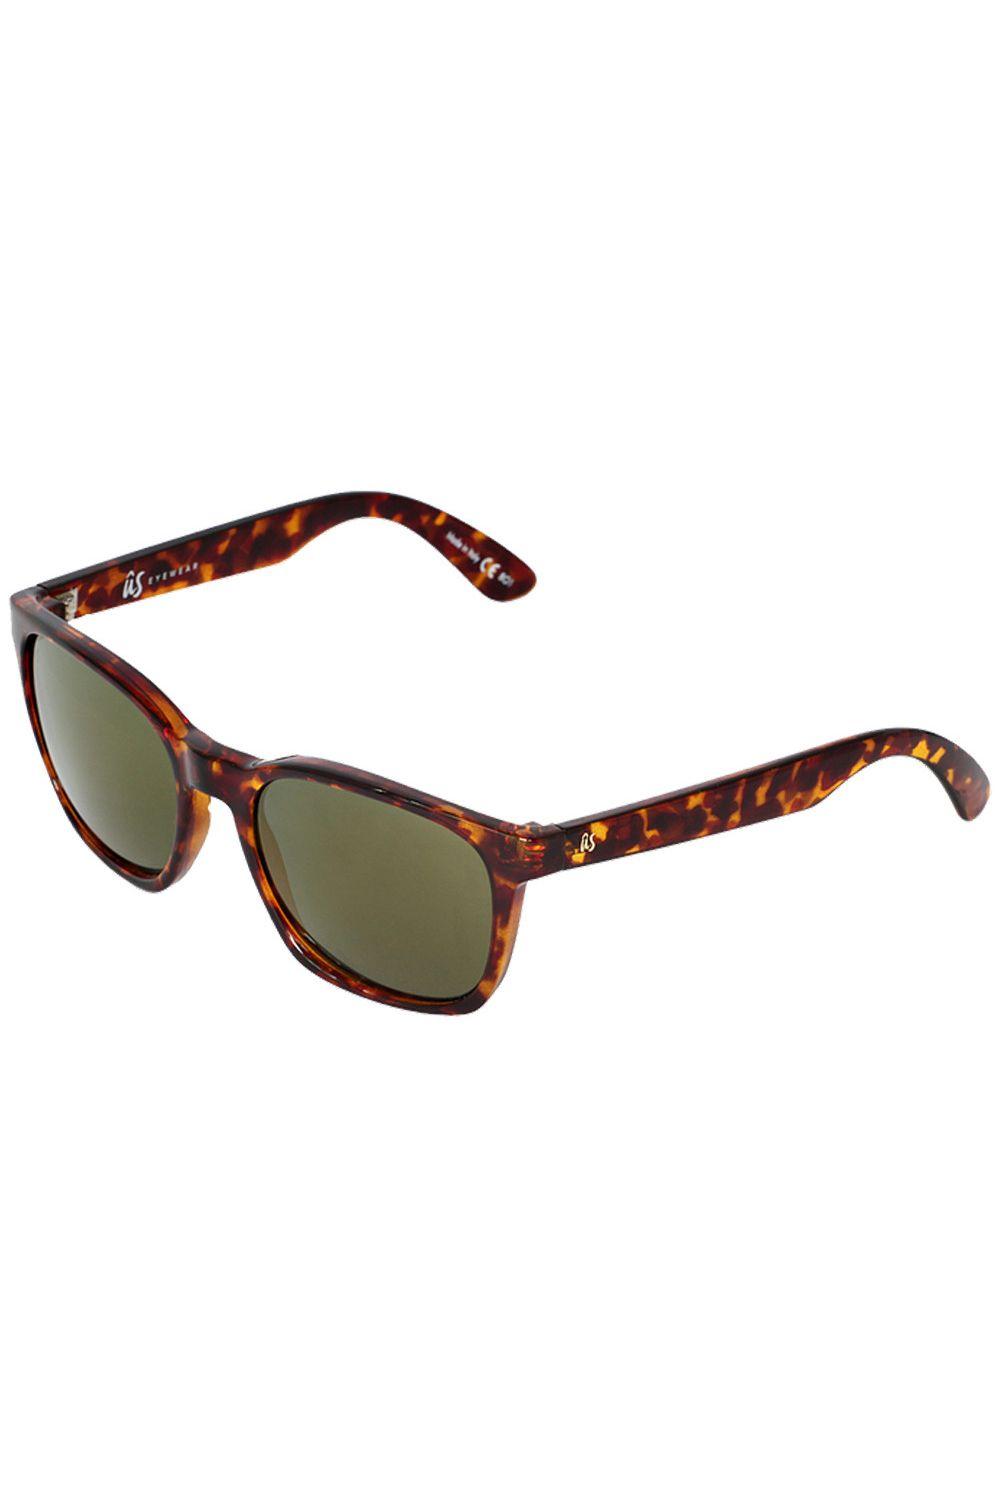 Oculos US BARYS Gloss Tort/Grey Gold Chrome